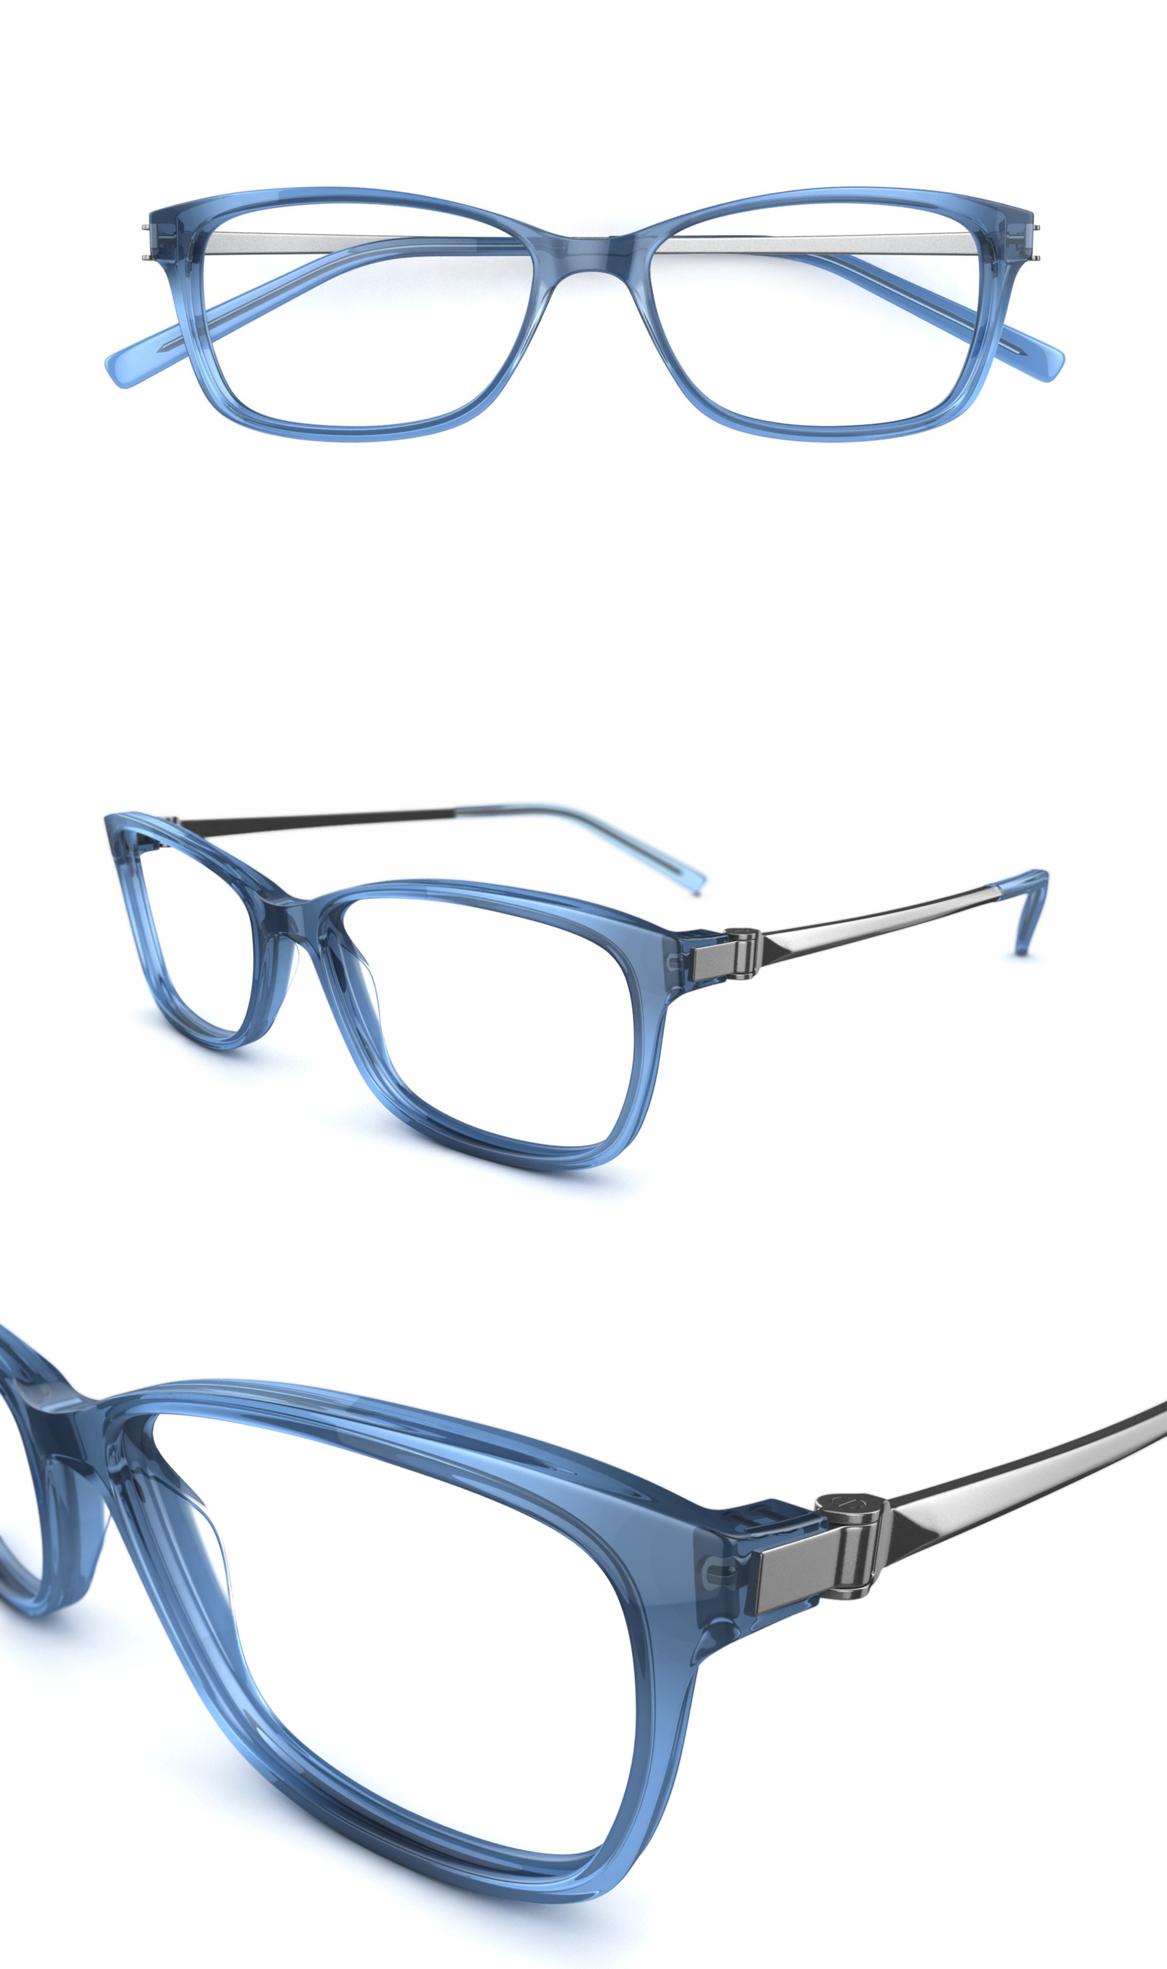 Saluda Womens glasses, Glasses, Blue frames